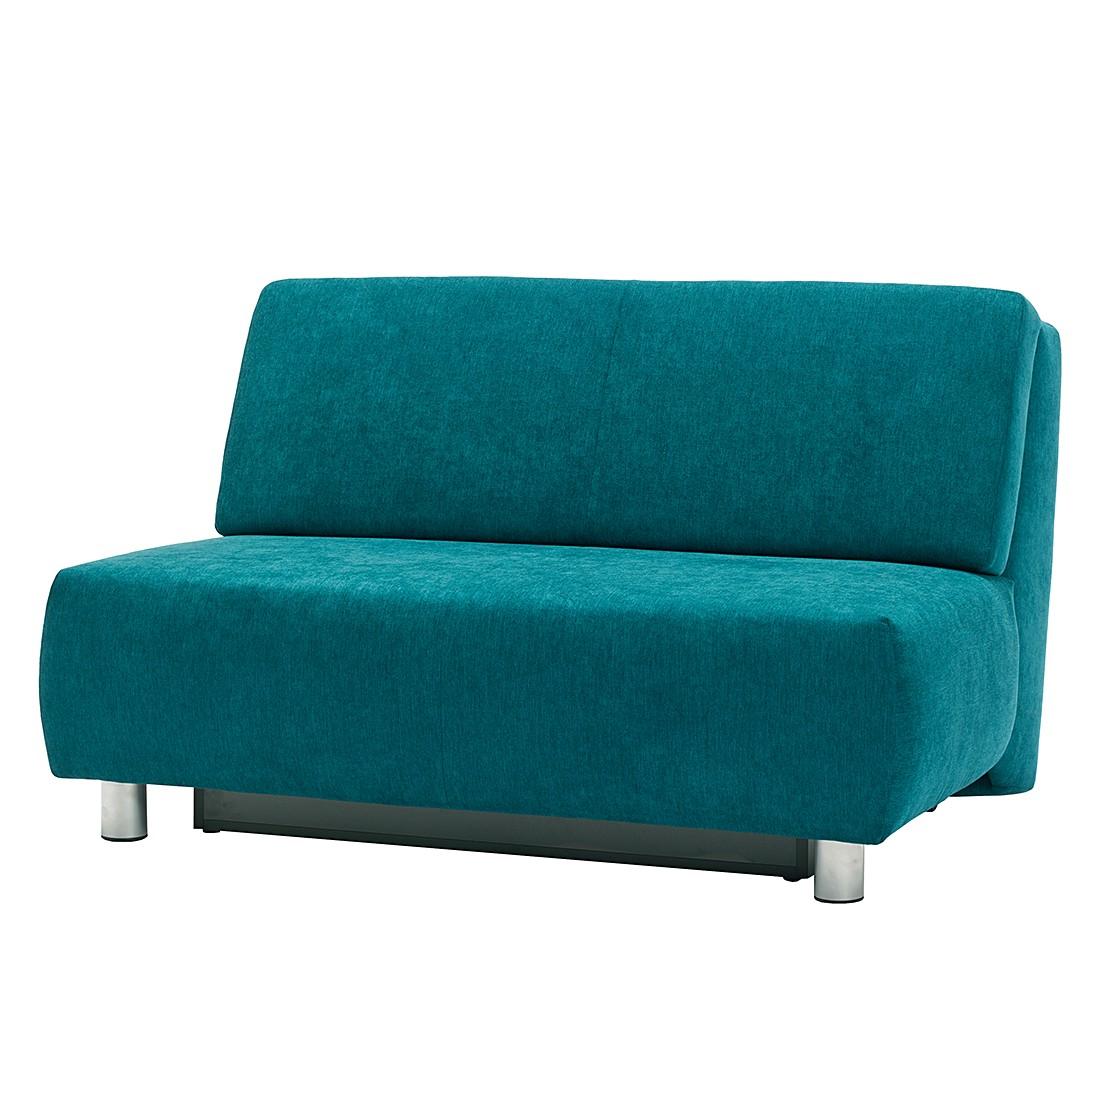 Schlafsofa 140 cm sofa 140 breit haus dekoration for Schlafsofa 140 cm